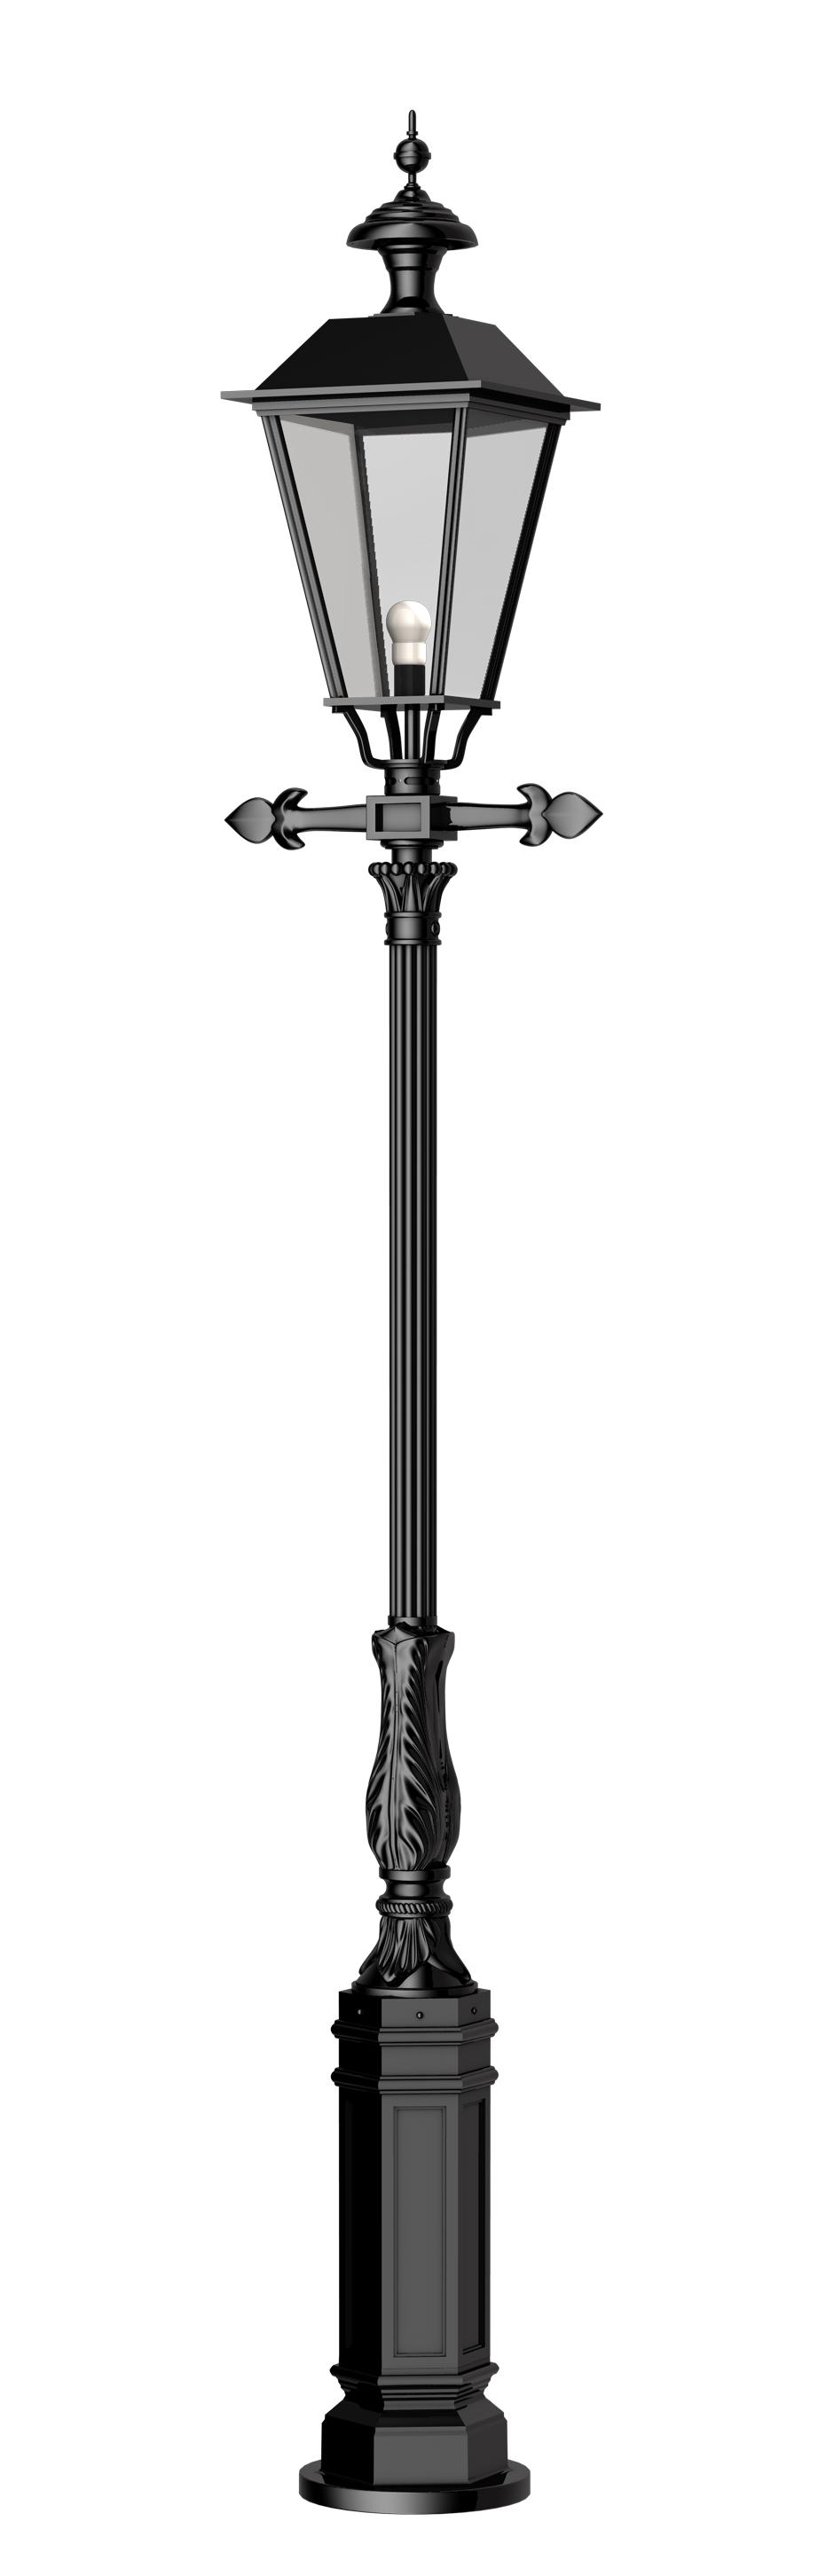 70-1622-315